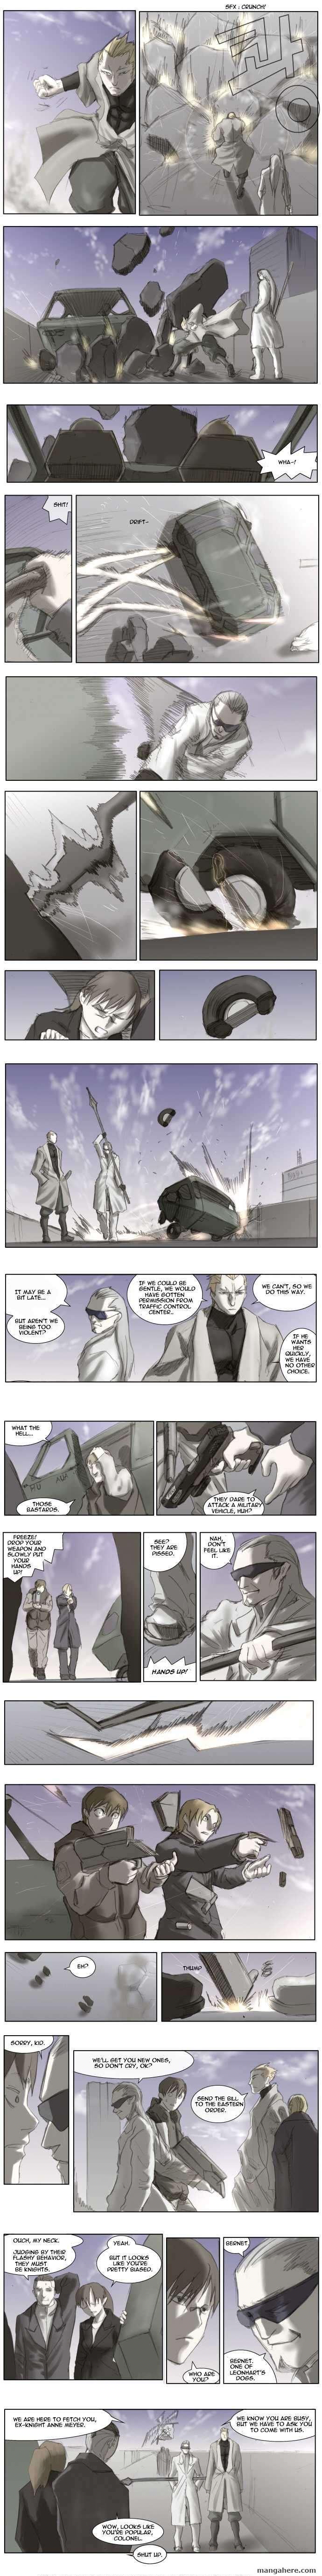 Knight Run 16 Page 1